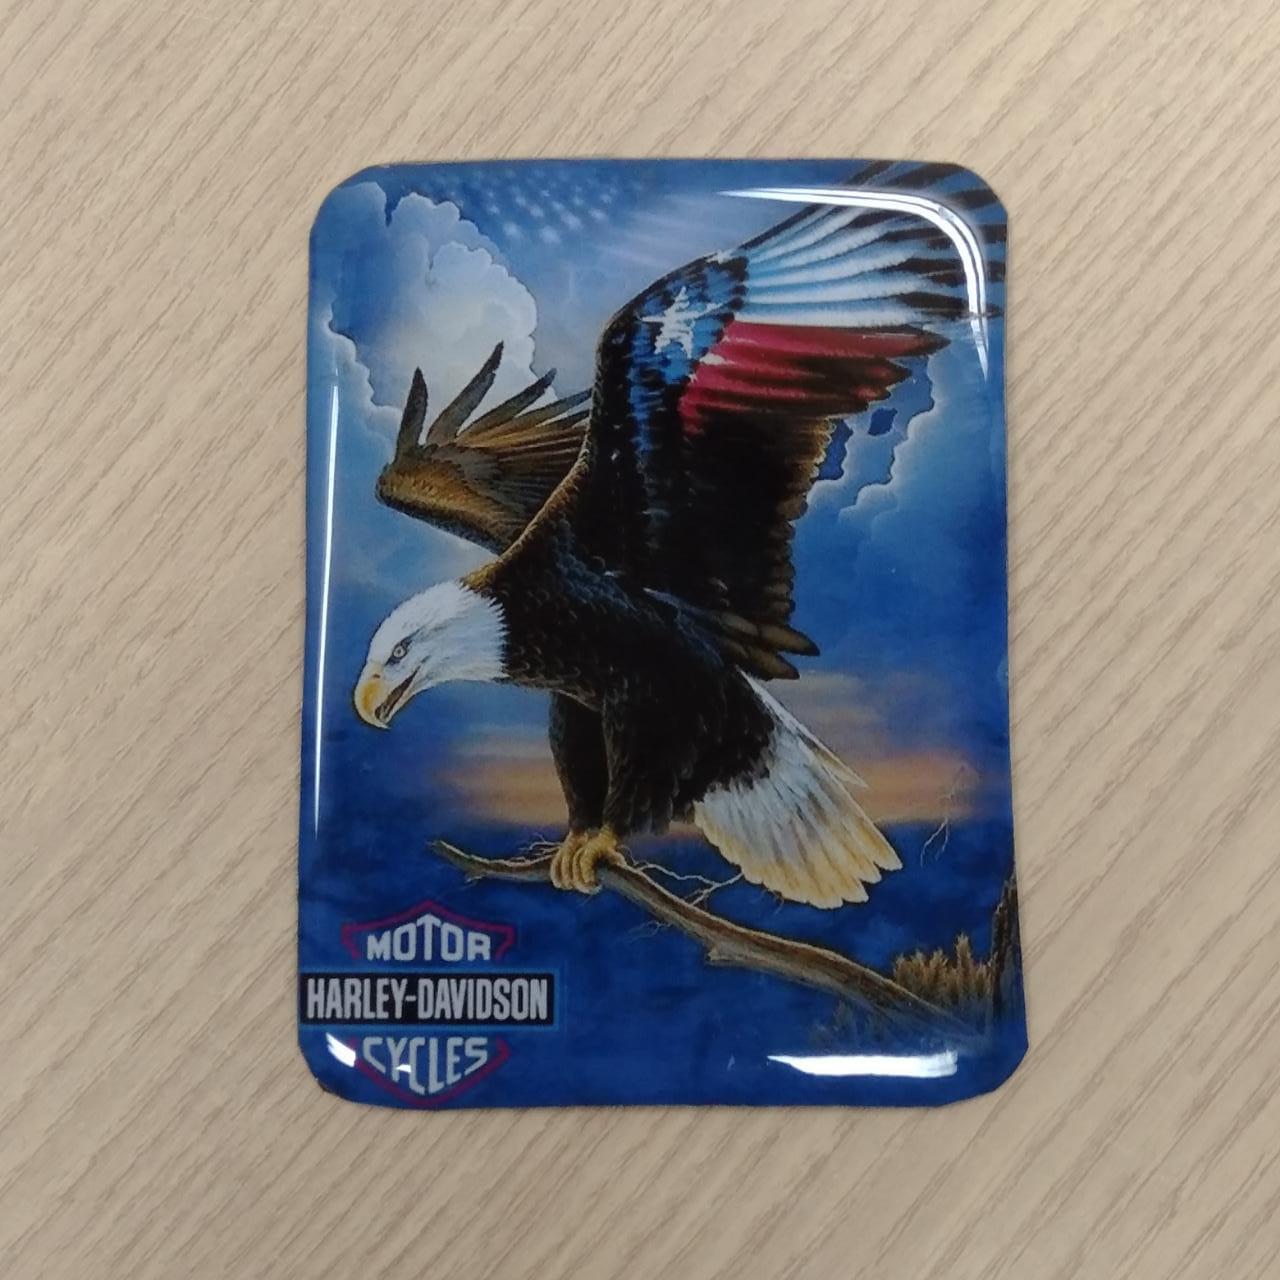 Imã de Geladeira - Motivo Harley-Davidson - MD 04 - 022/48560